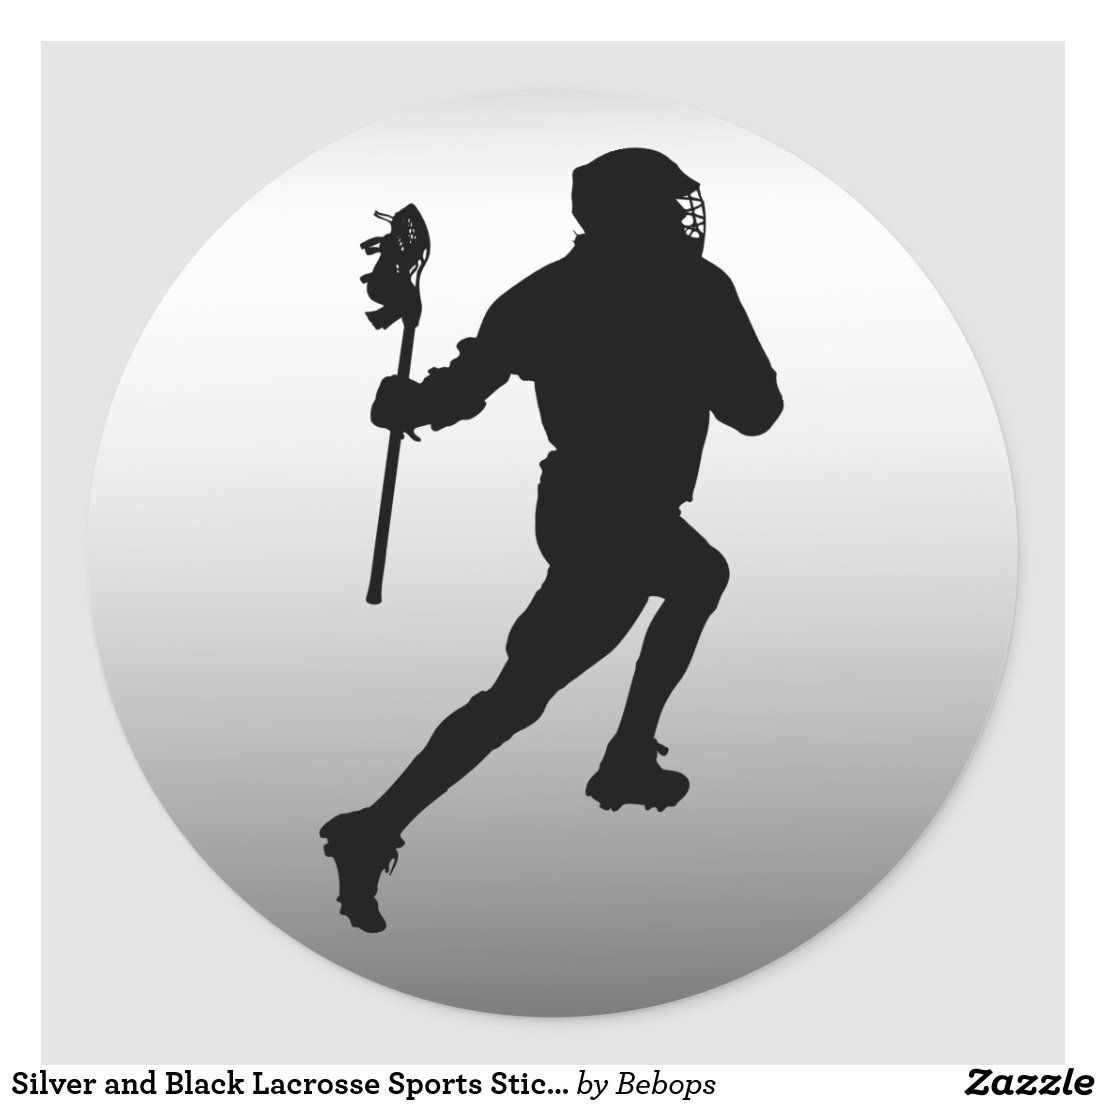 Silver And Black Lacrosse Sports Sticker Zazzle Com Lacrosse Sport Lacrosse Sports [ 1106 x 1106 Pixel ]